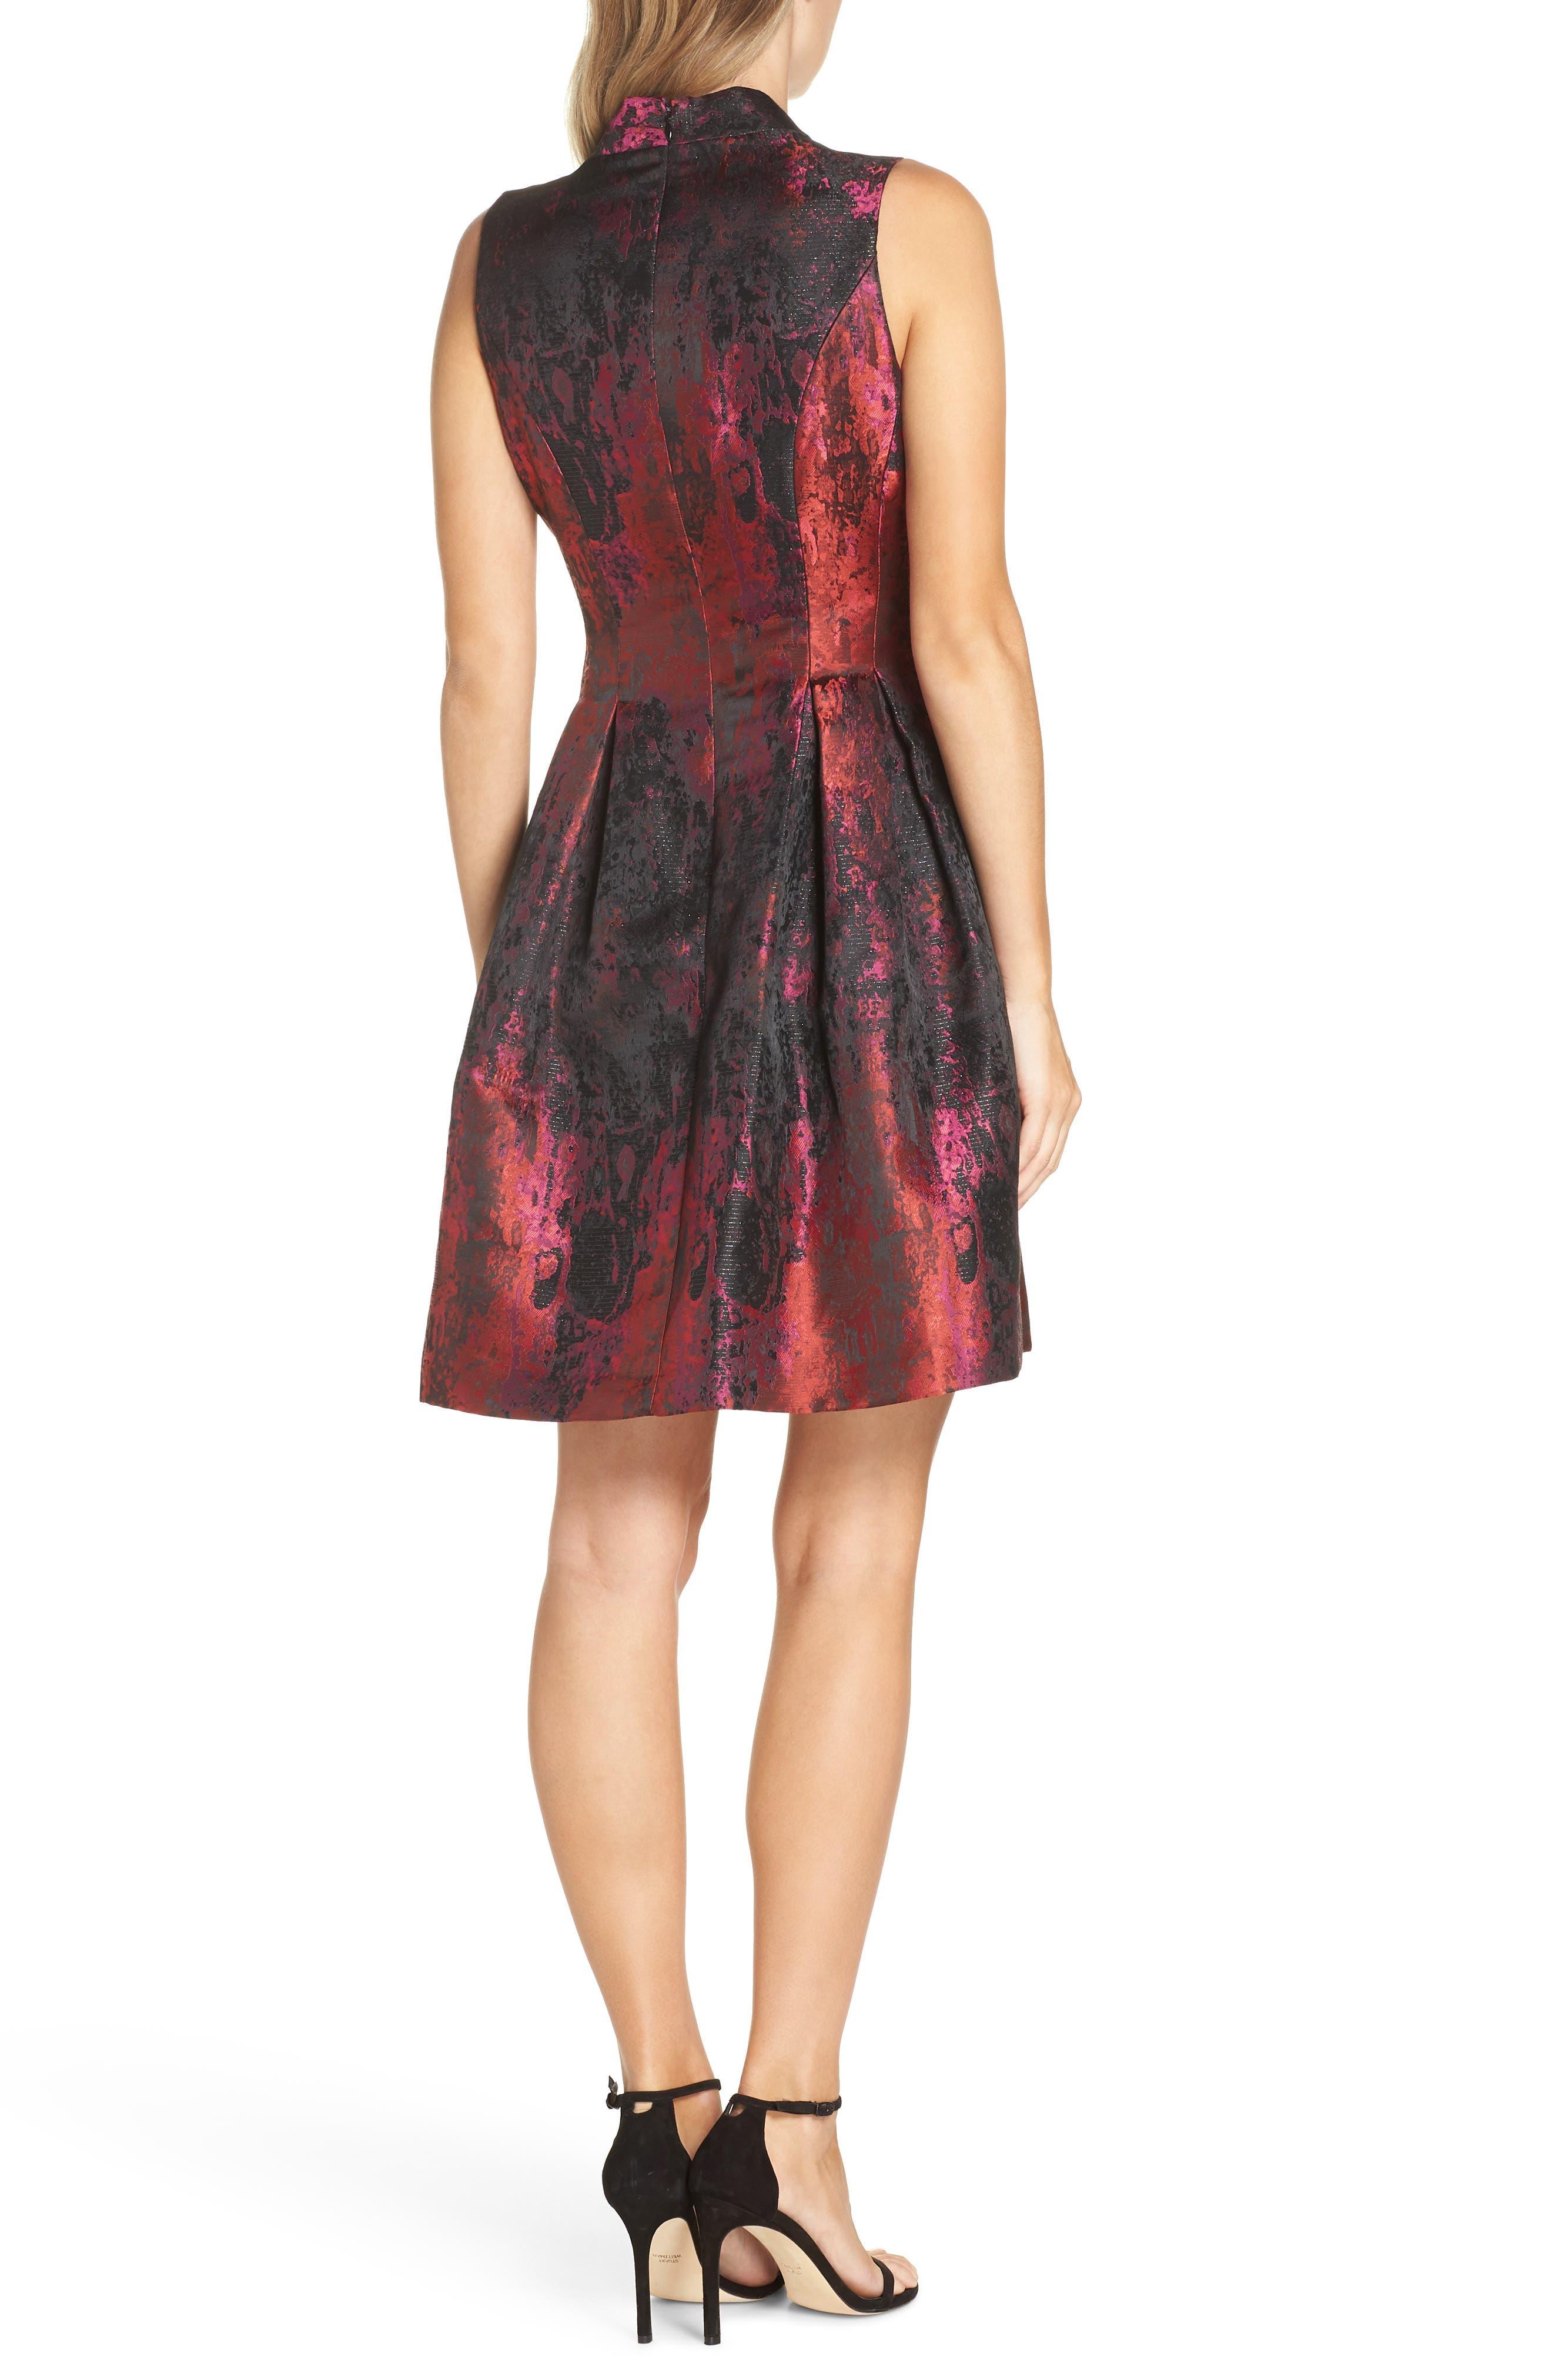 VINCE CAMUTO, Jacquard Fit & Flare Dress, Alternate thumbnail 2, color, 653